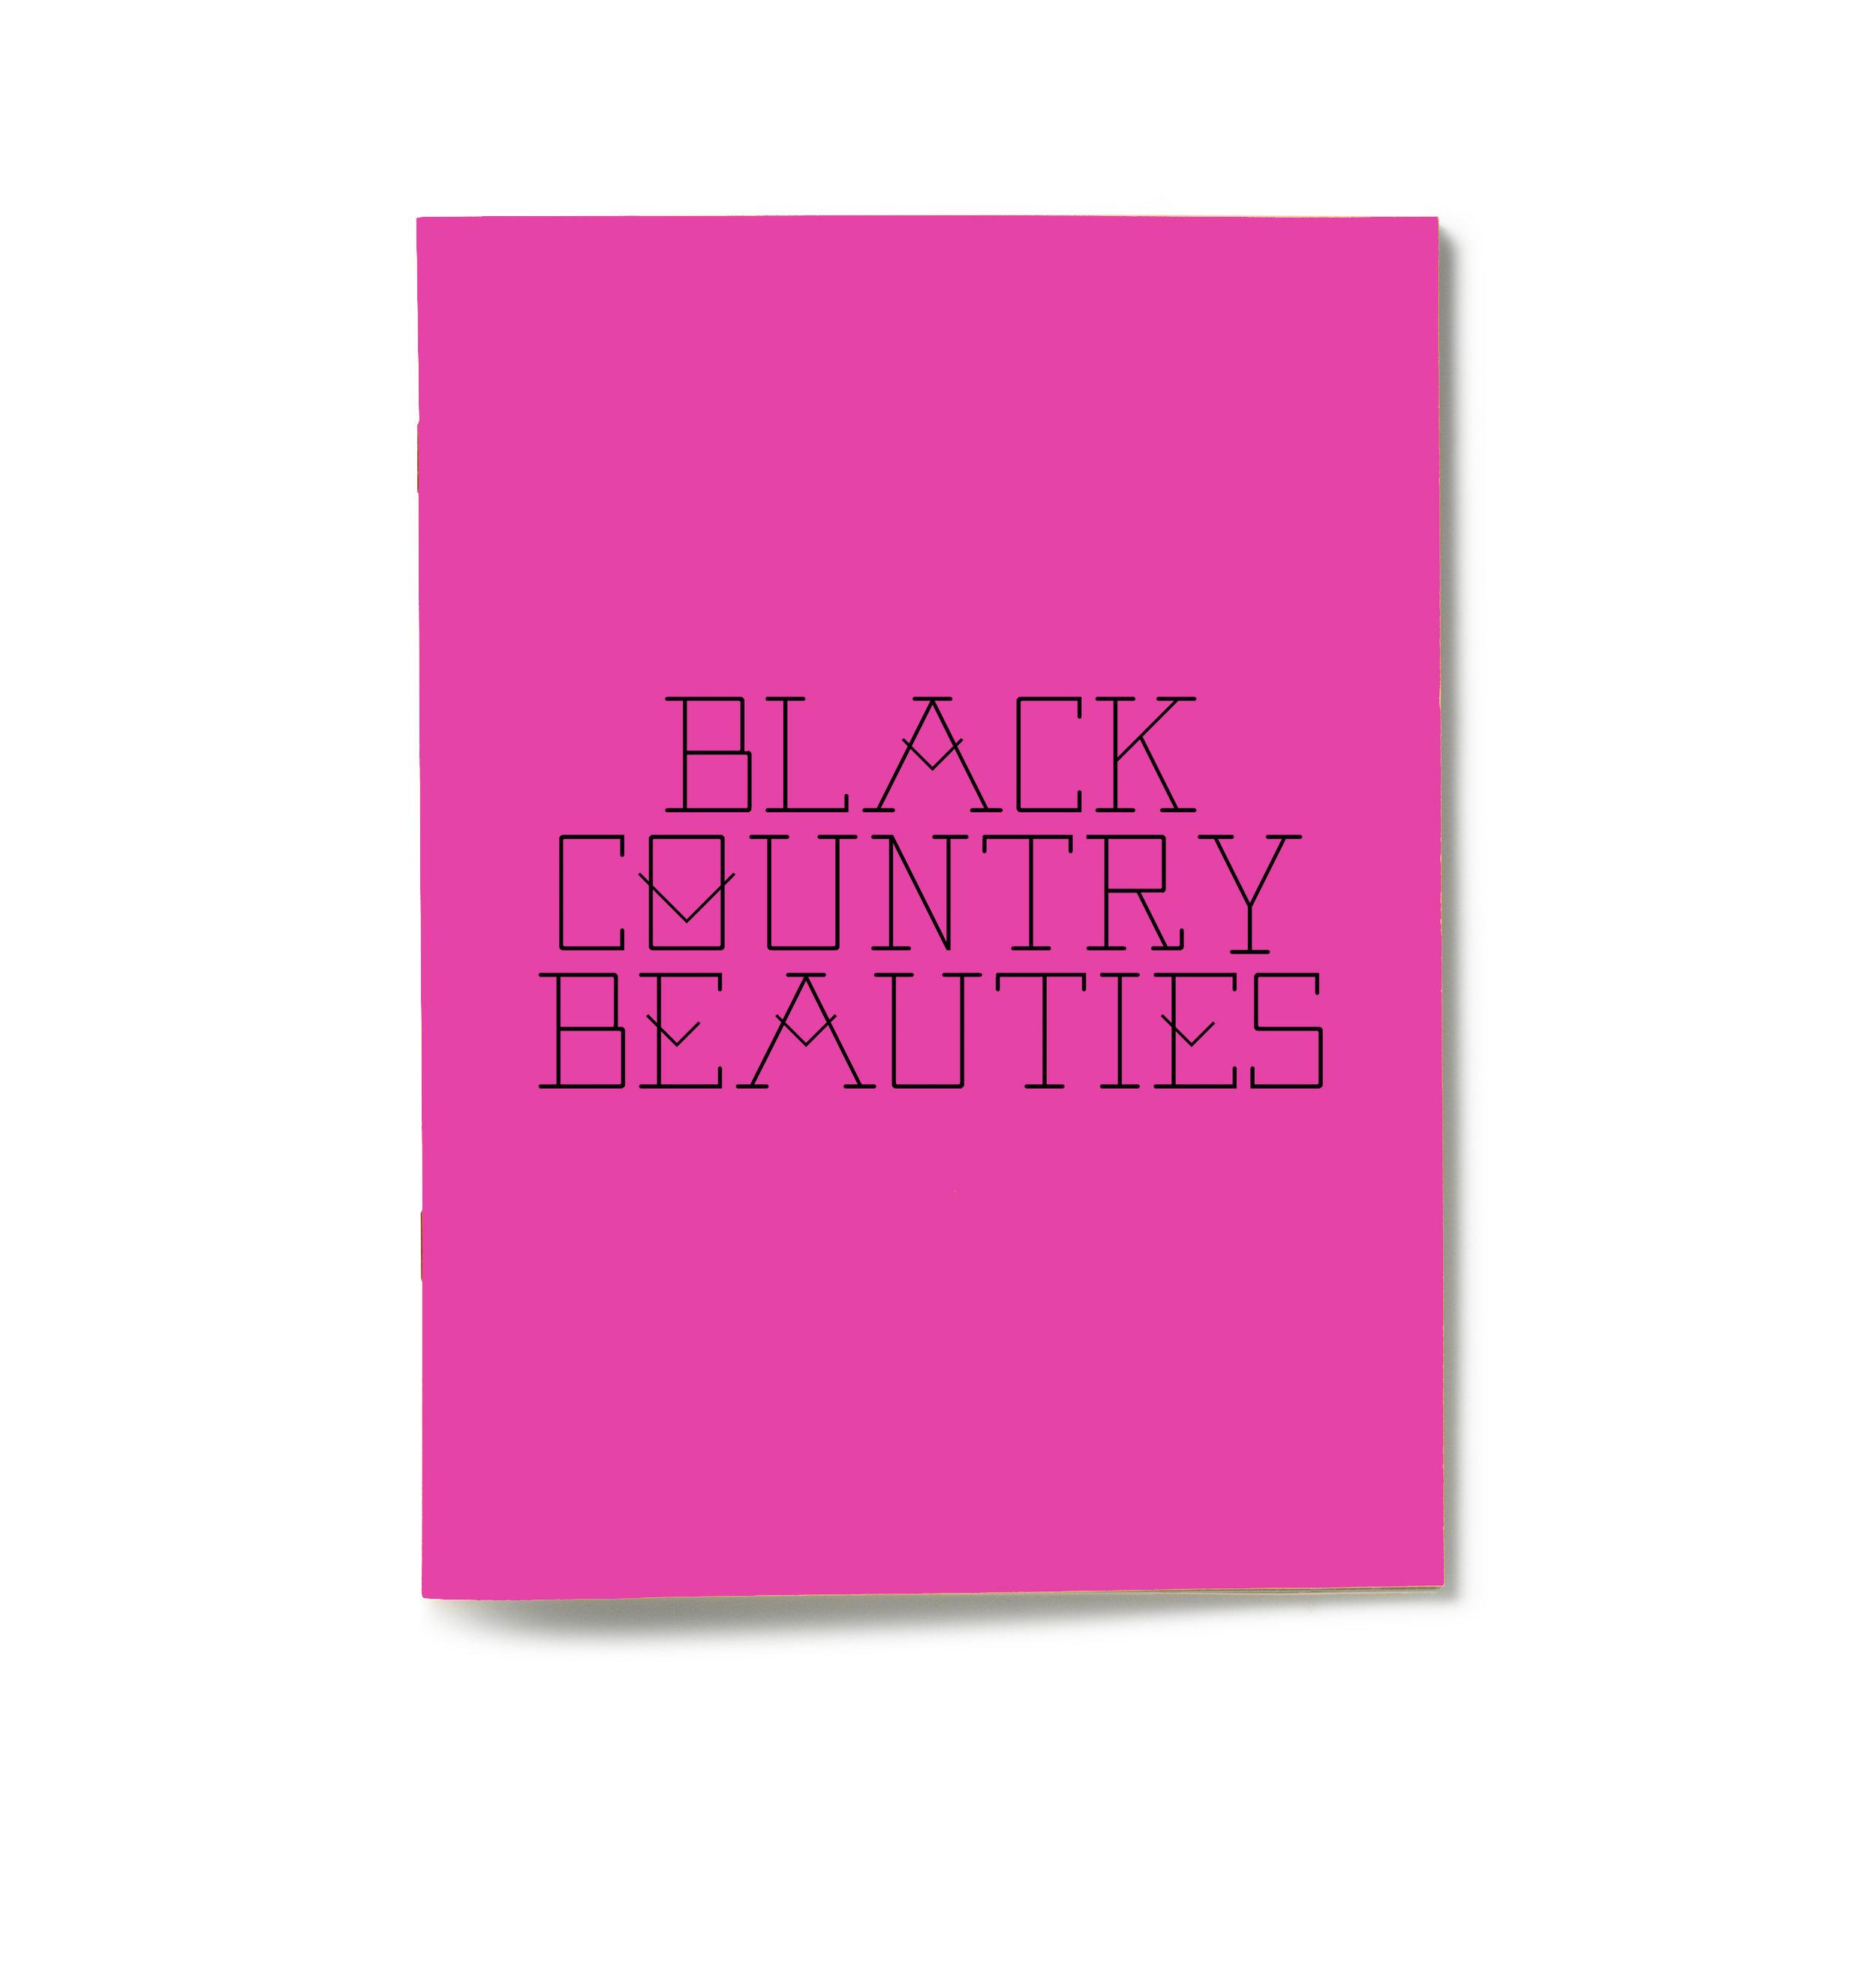 black country beauties cover.jpg